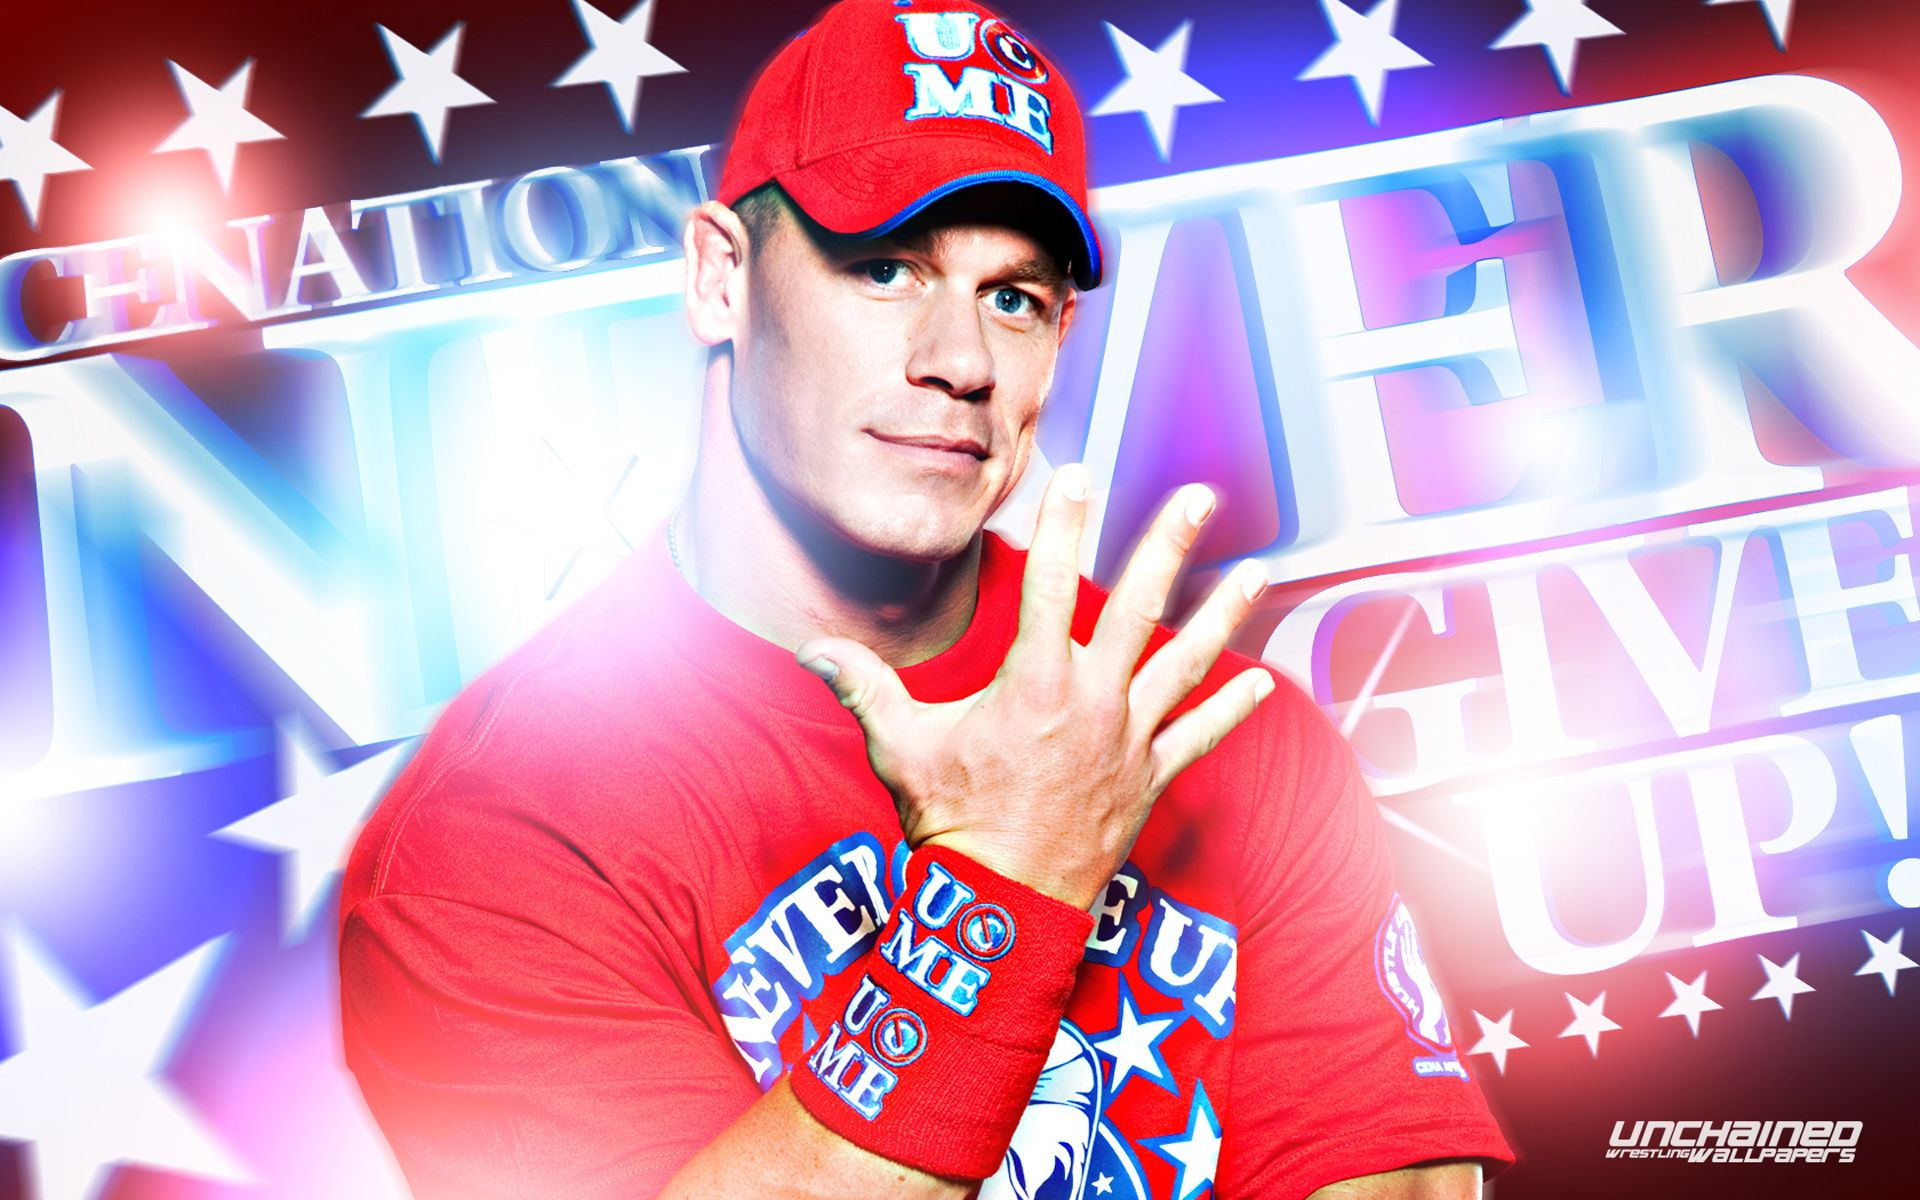 John cena - John Cena Wallpapers Cenation The Rock Vs John Cena Wrestlemania Triple H Randy